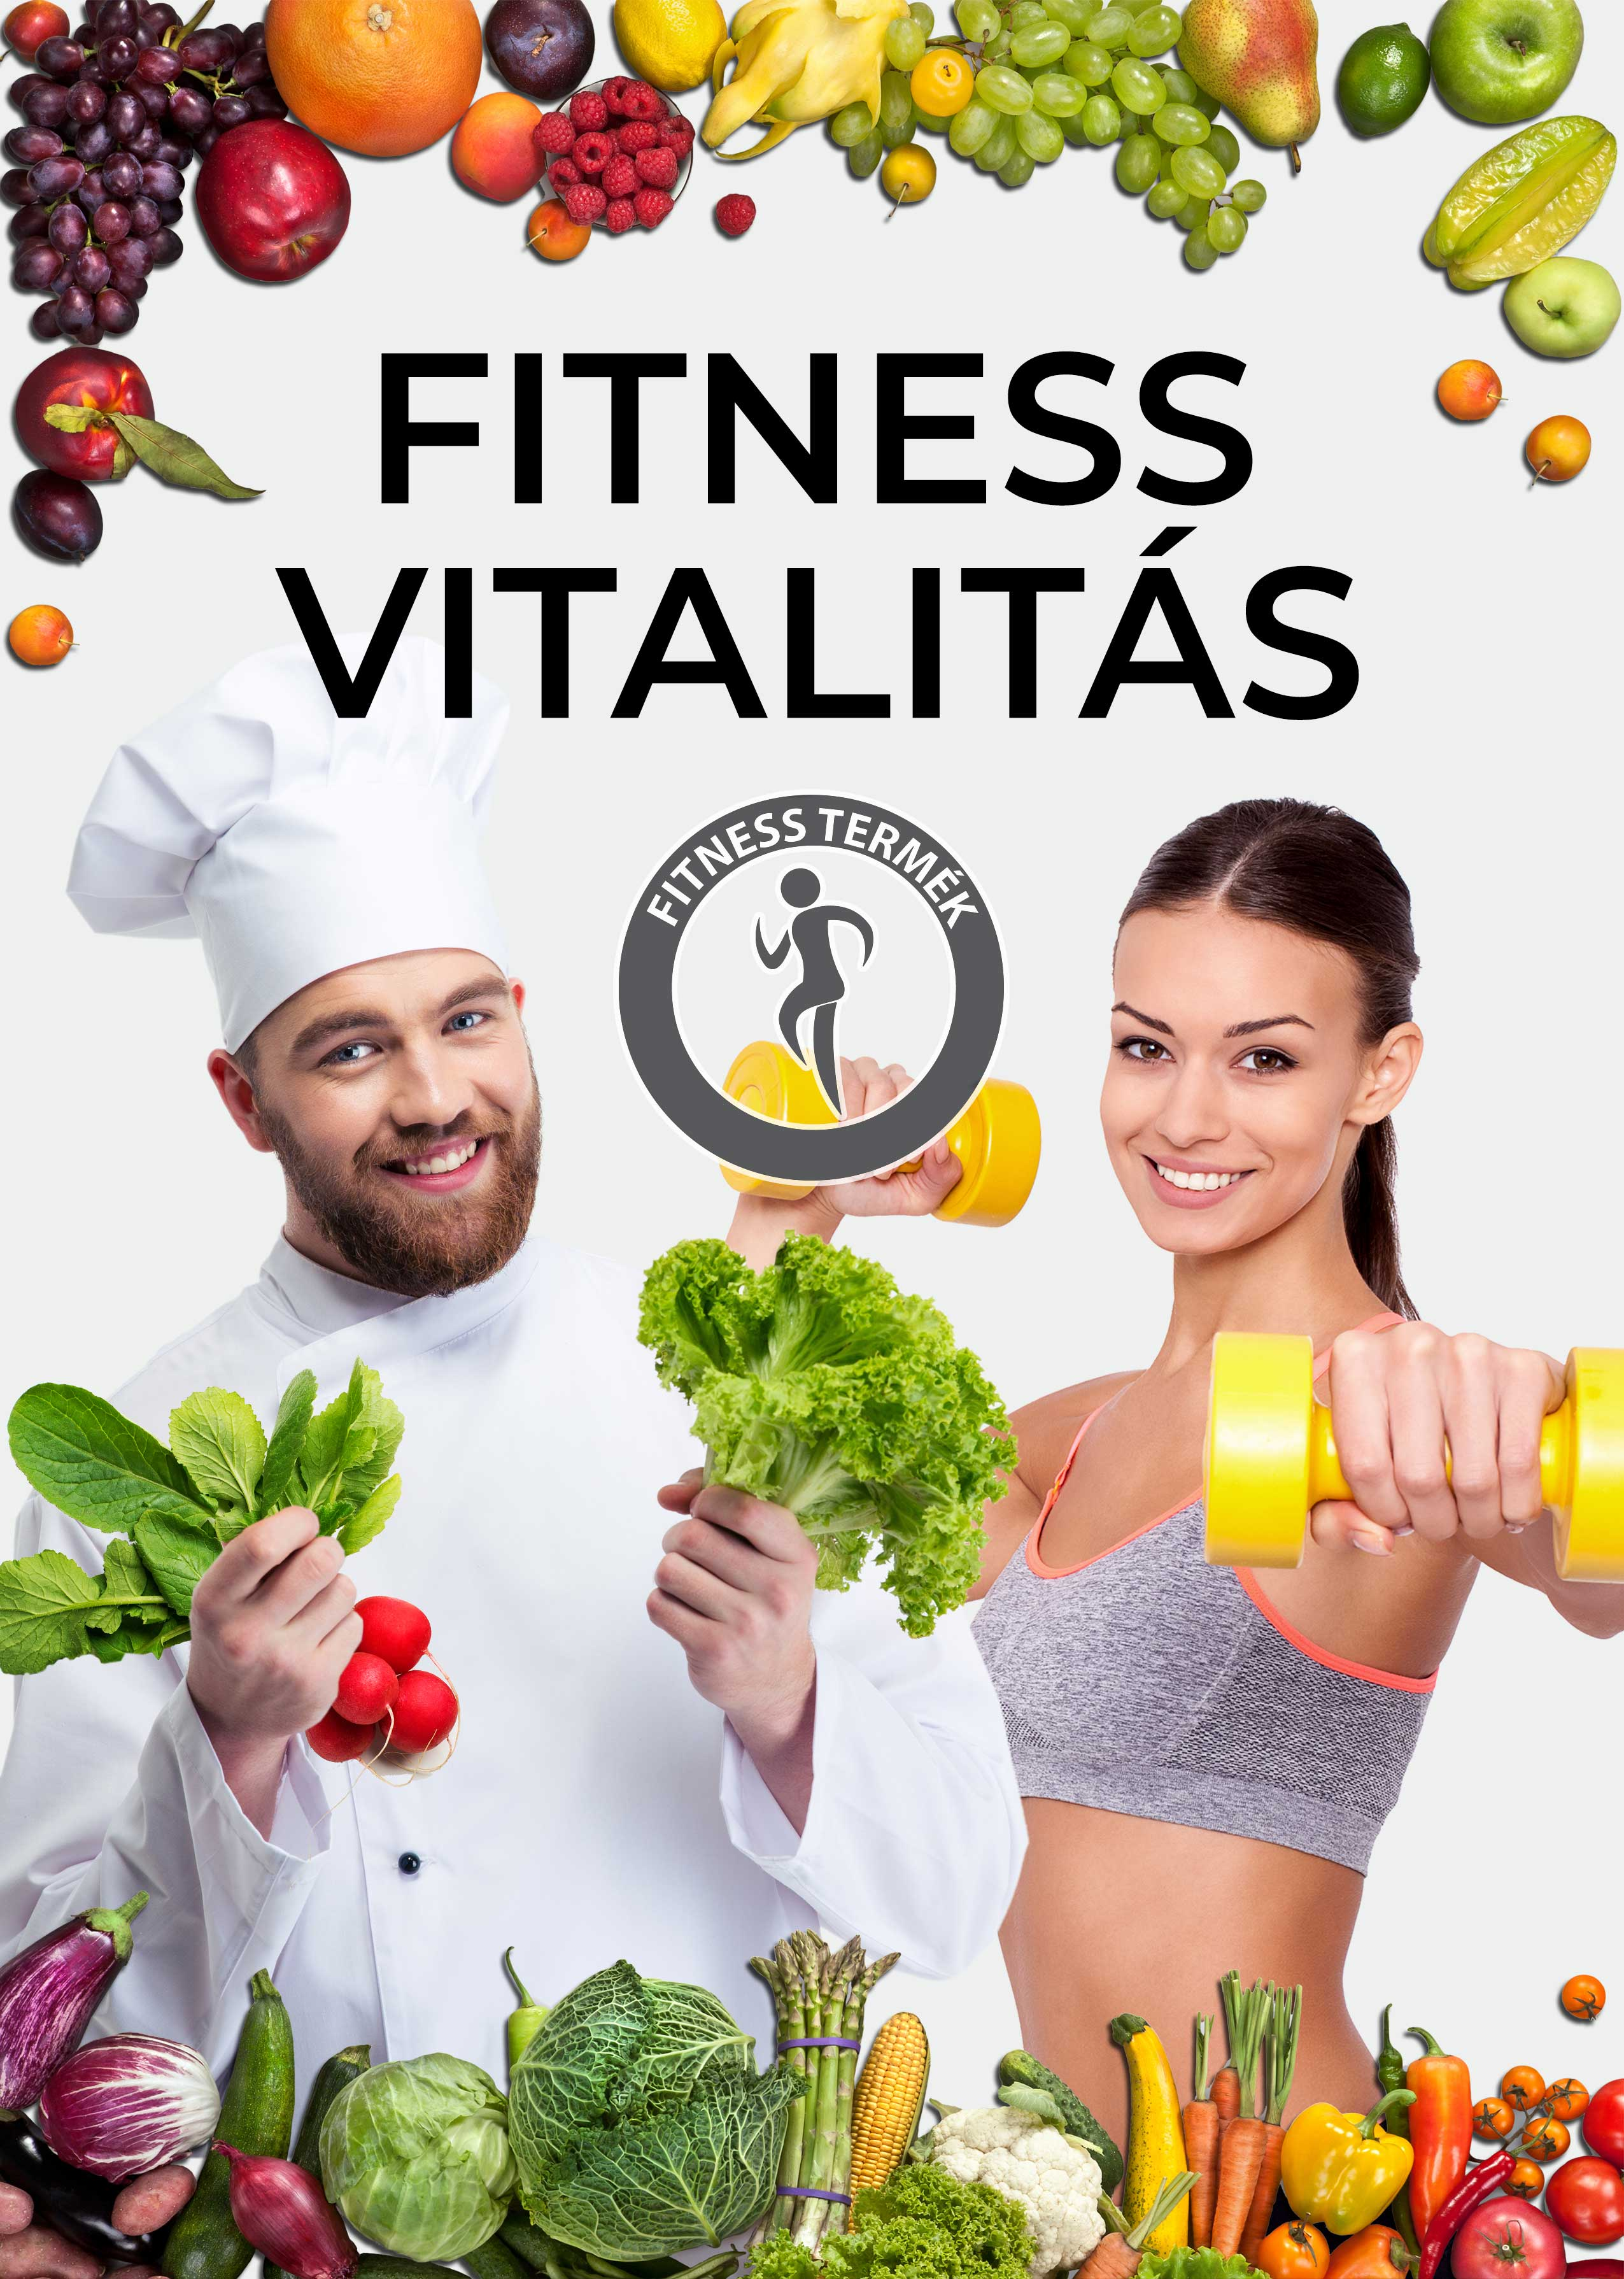 Fitness-vitalitás katalógus